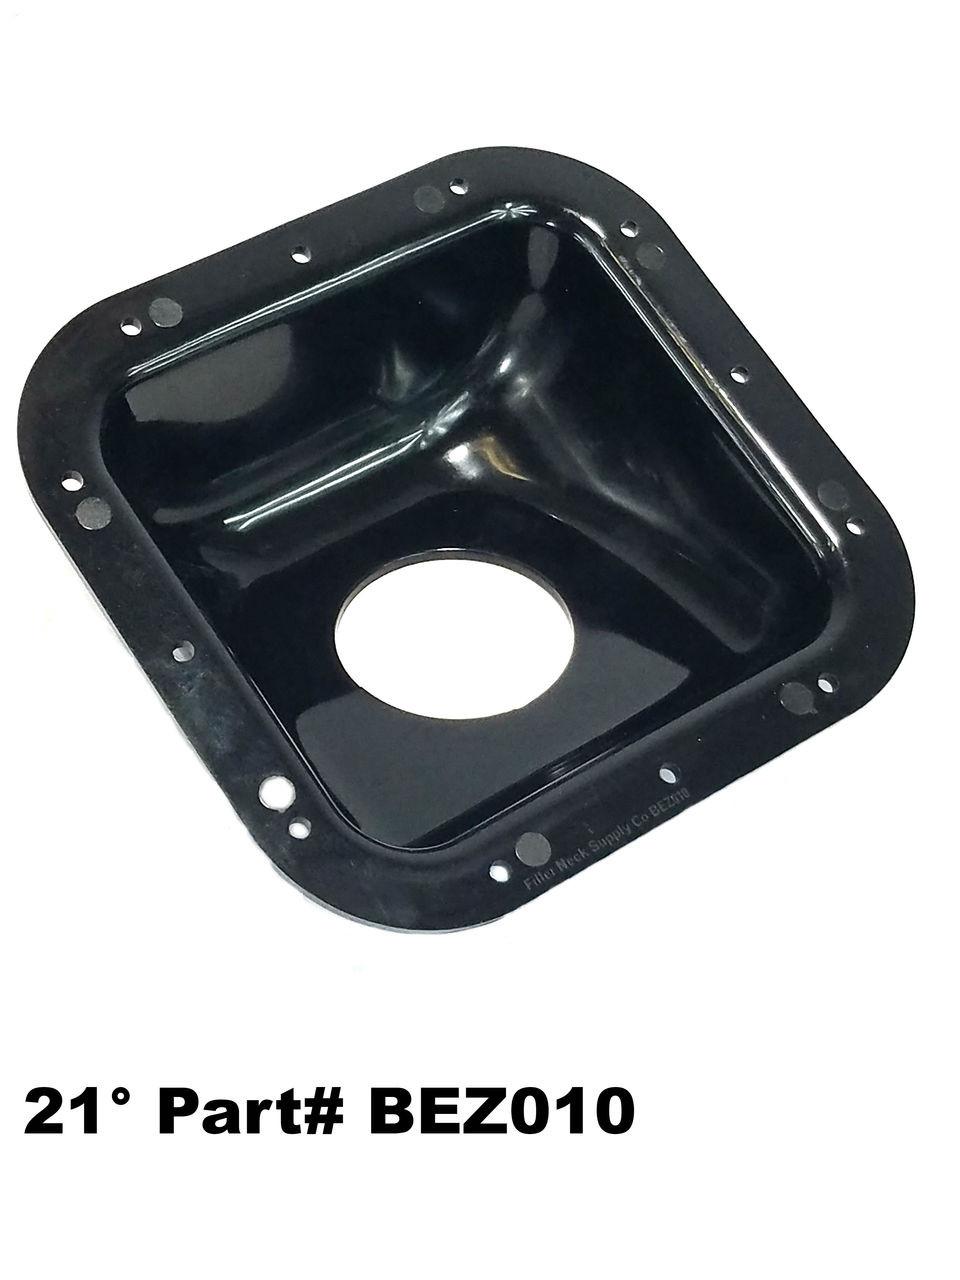 hight resolution of square plastic fuel filler neck protector dish bezel 21 degree housing bez010 frdf4tz